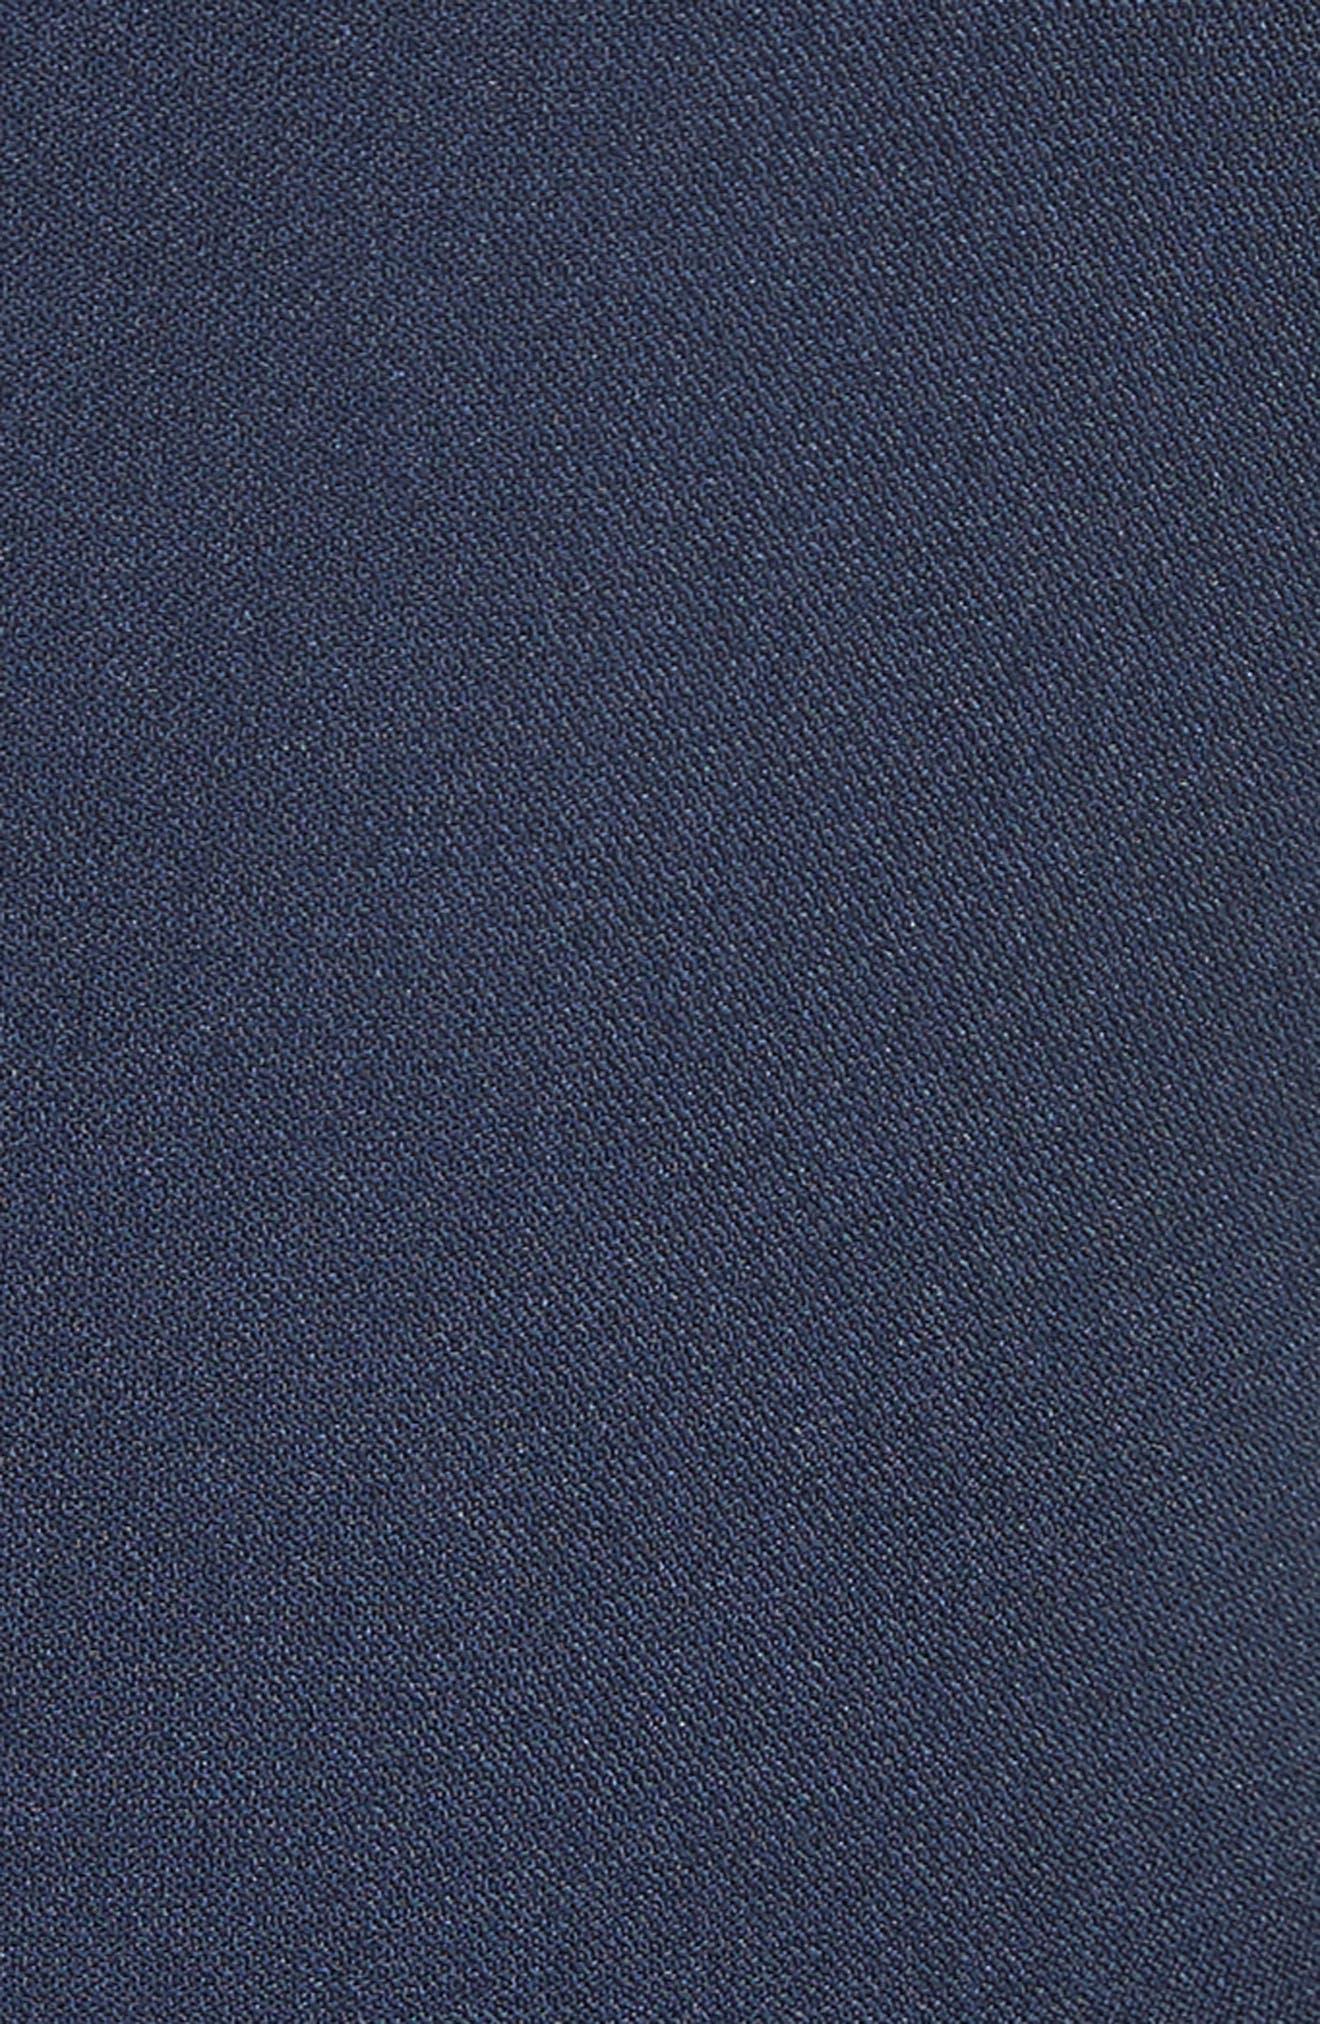 Aylin Bell Sleeve Dress,                             Alternate thumbnail 6, color,                             Squid Ink